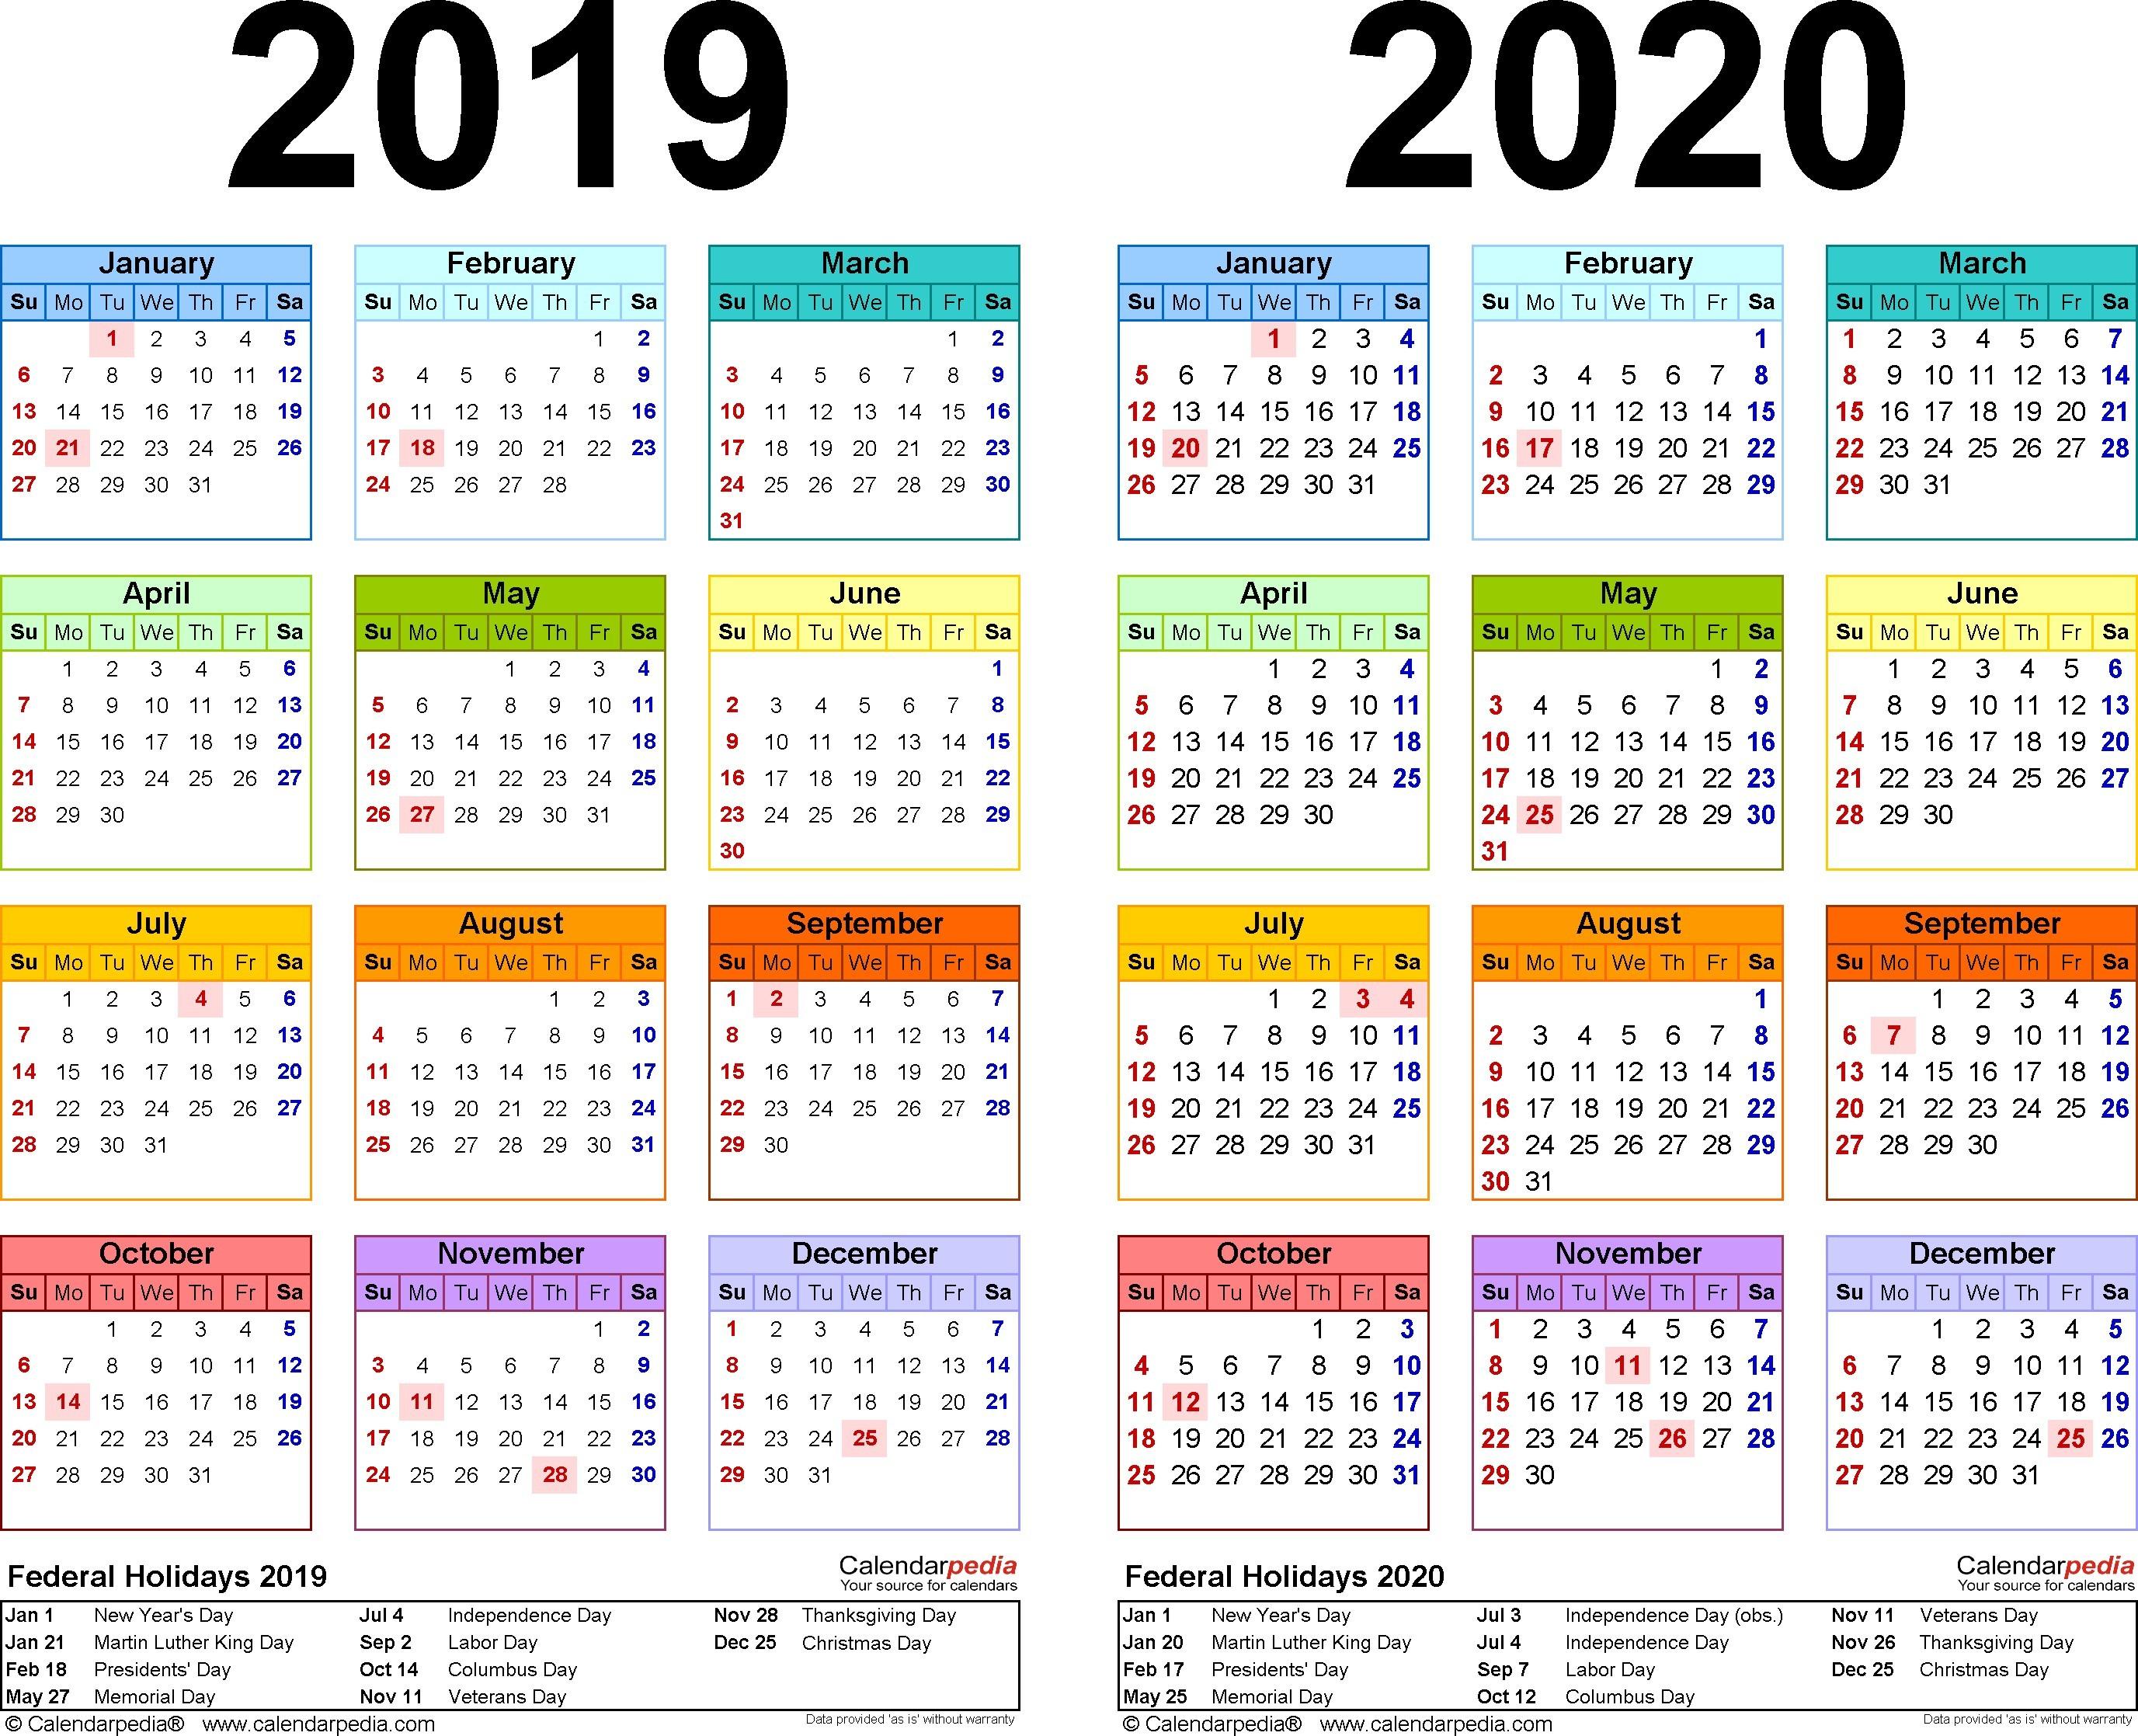 2018 and 2020 School Calendar Printable 2019 and 2019 School Year Calendar Printable 2019 2020